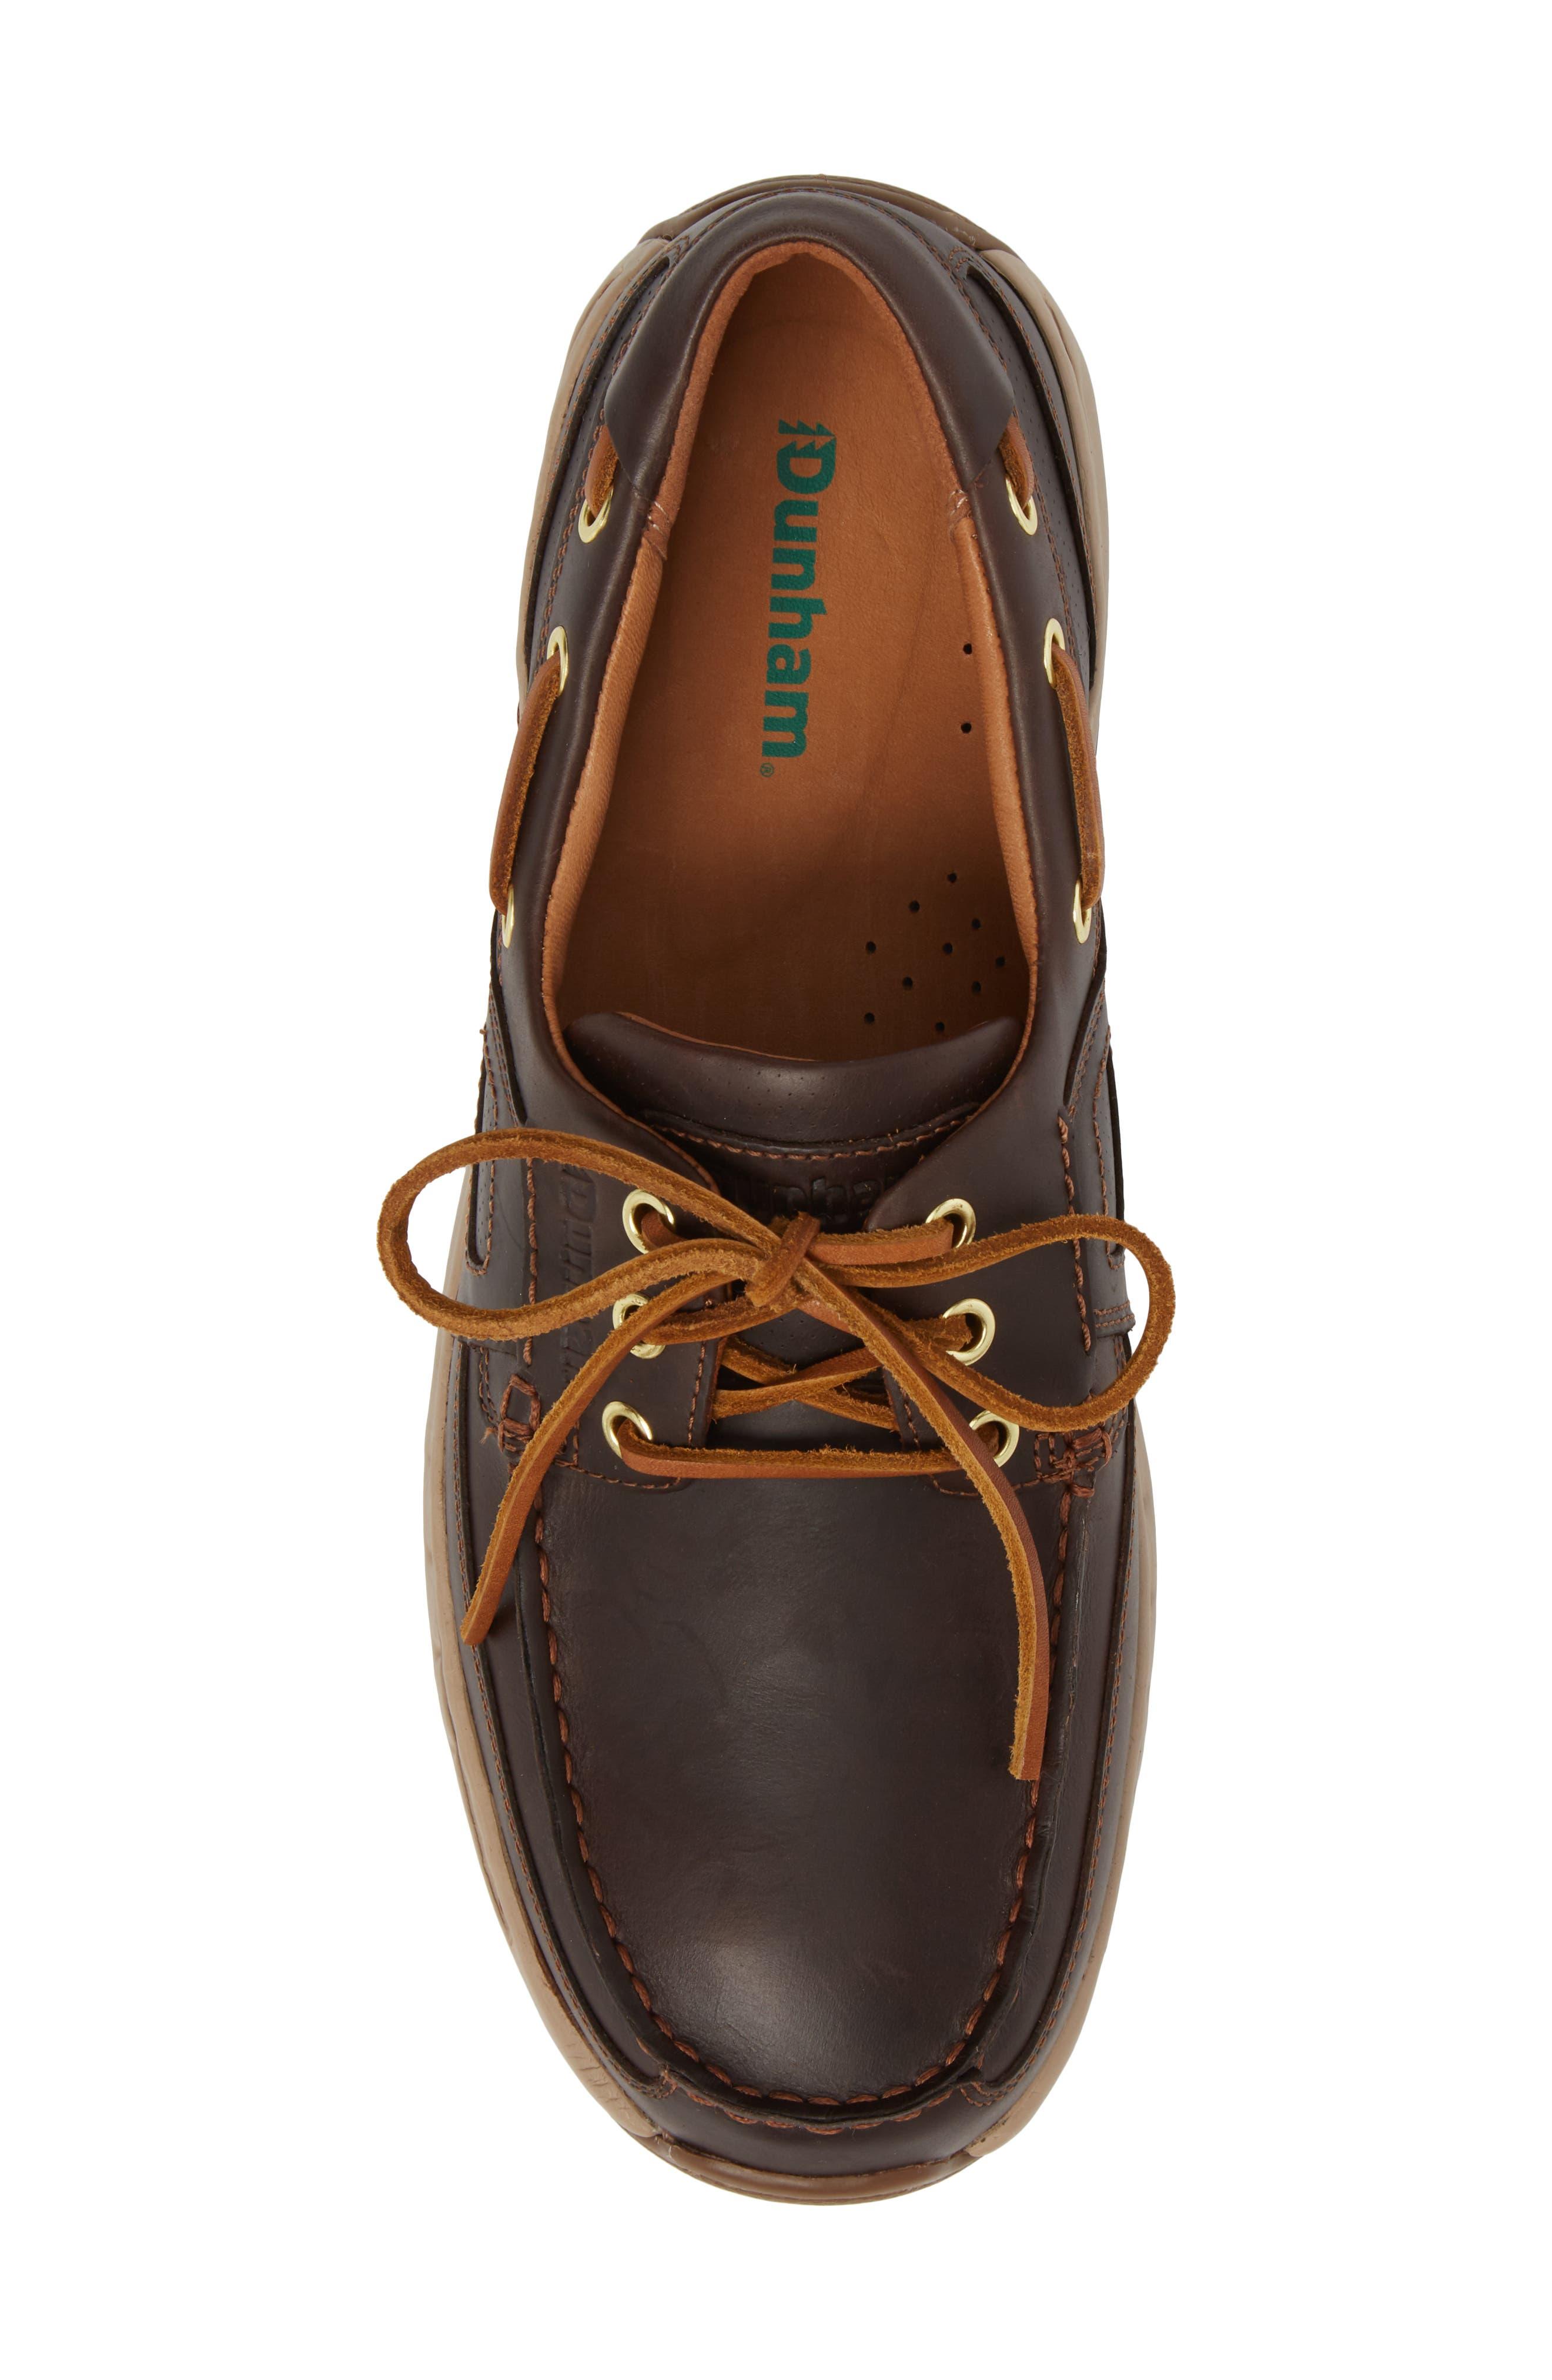 LTD Water Resistant Boat Shoe,                             Alternate thumbnail 5, color,                             Tan Leather